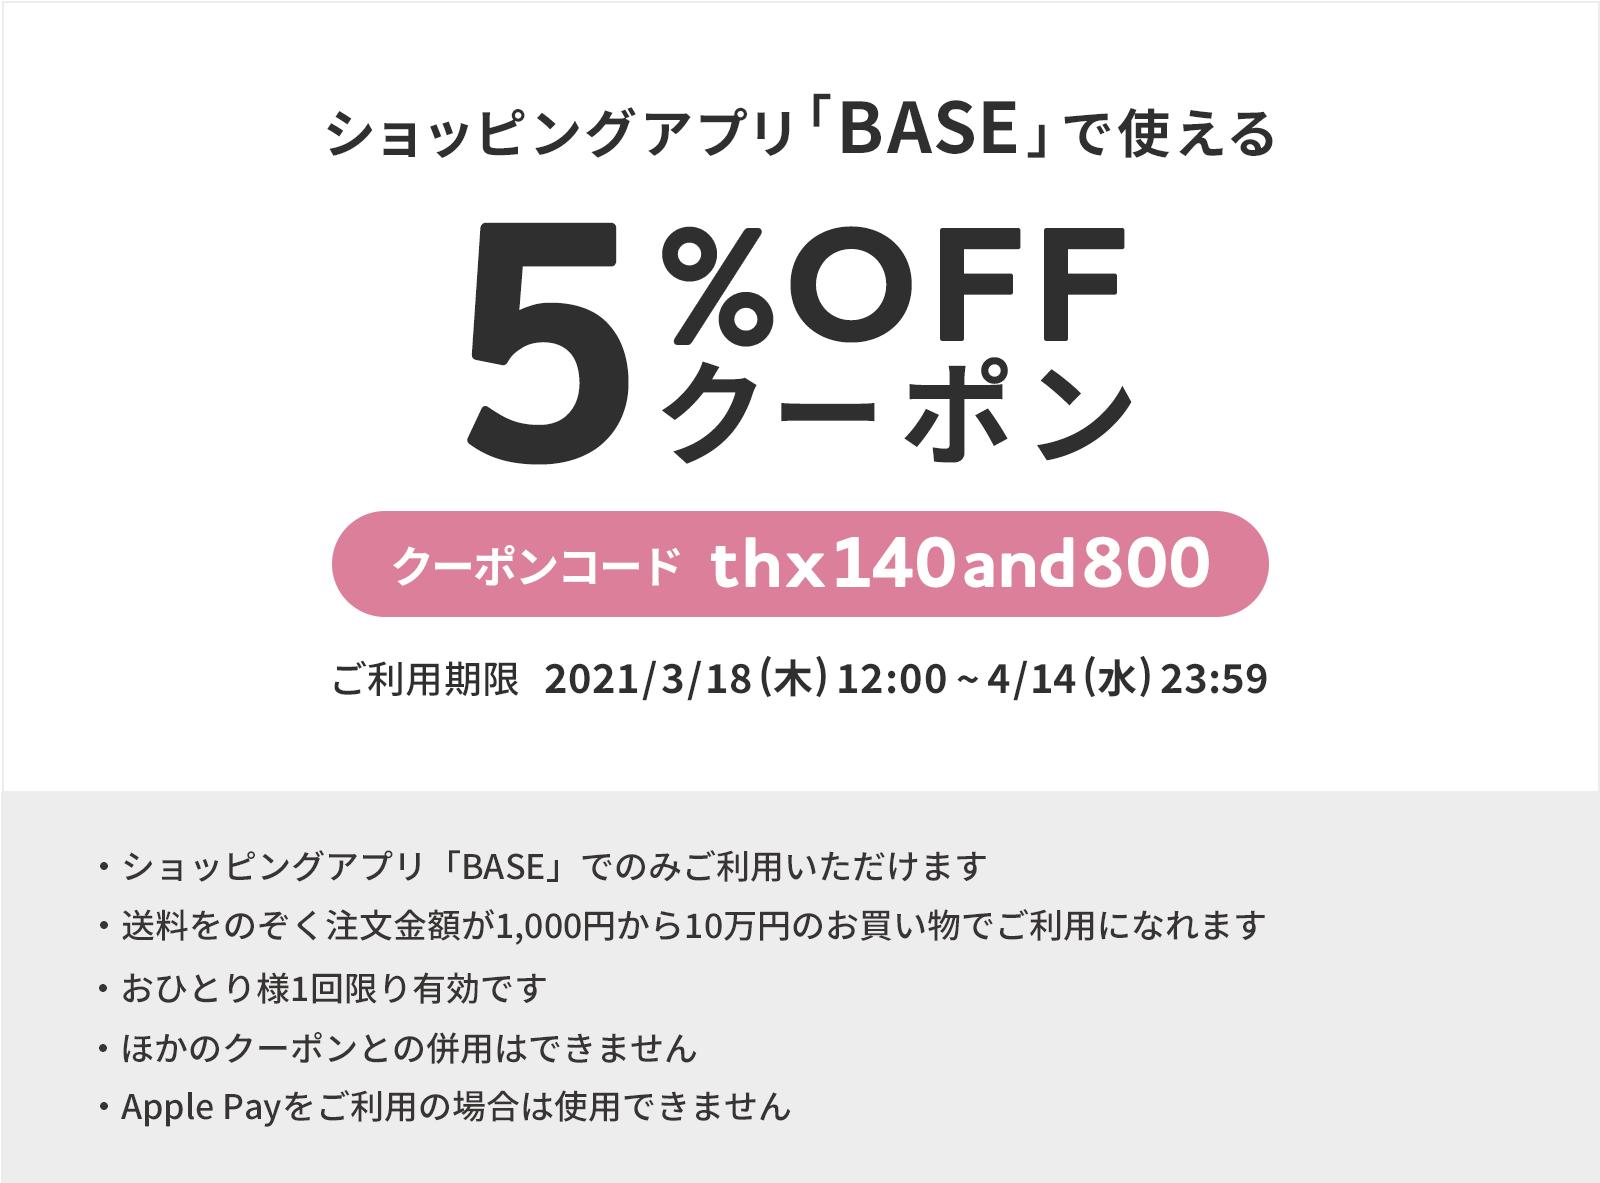 「BASE」アプリでご利用頂ける5%オフクーポン配布中です